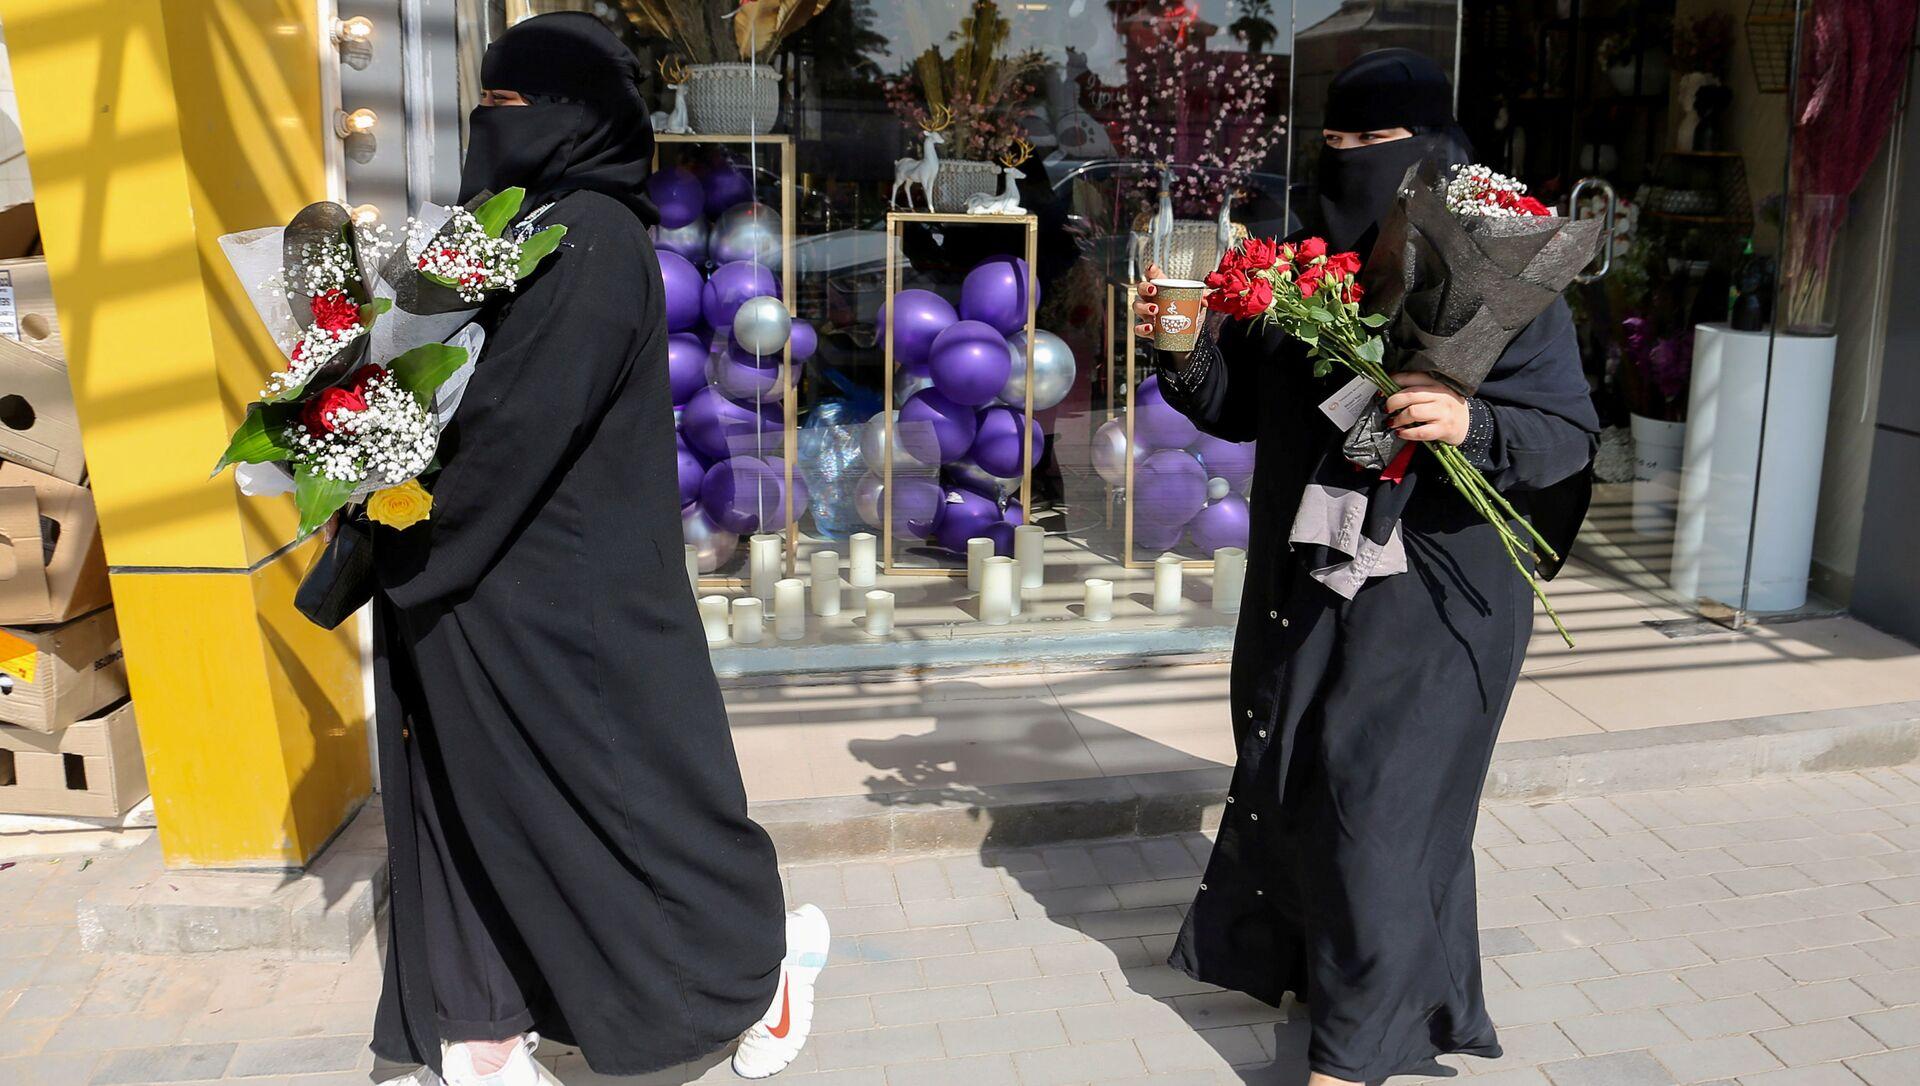 Donne con dei fiori a Riyadh in Arabia Saudita - Sputnik Italia, 1920, 10.05.2021